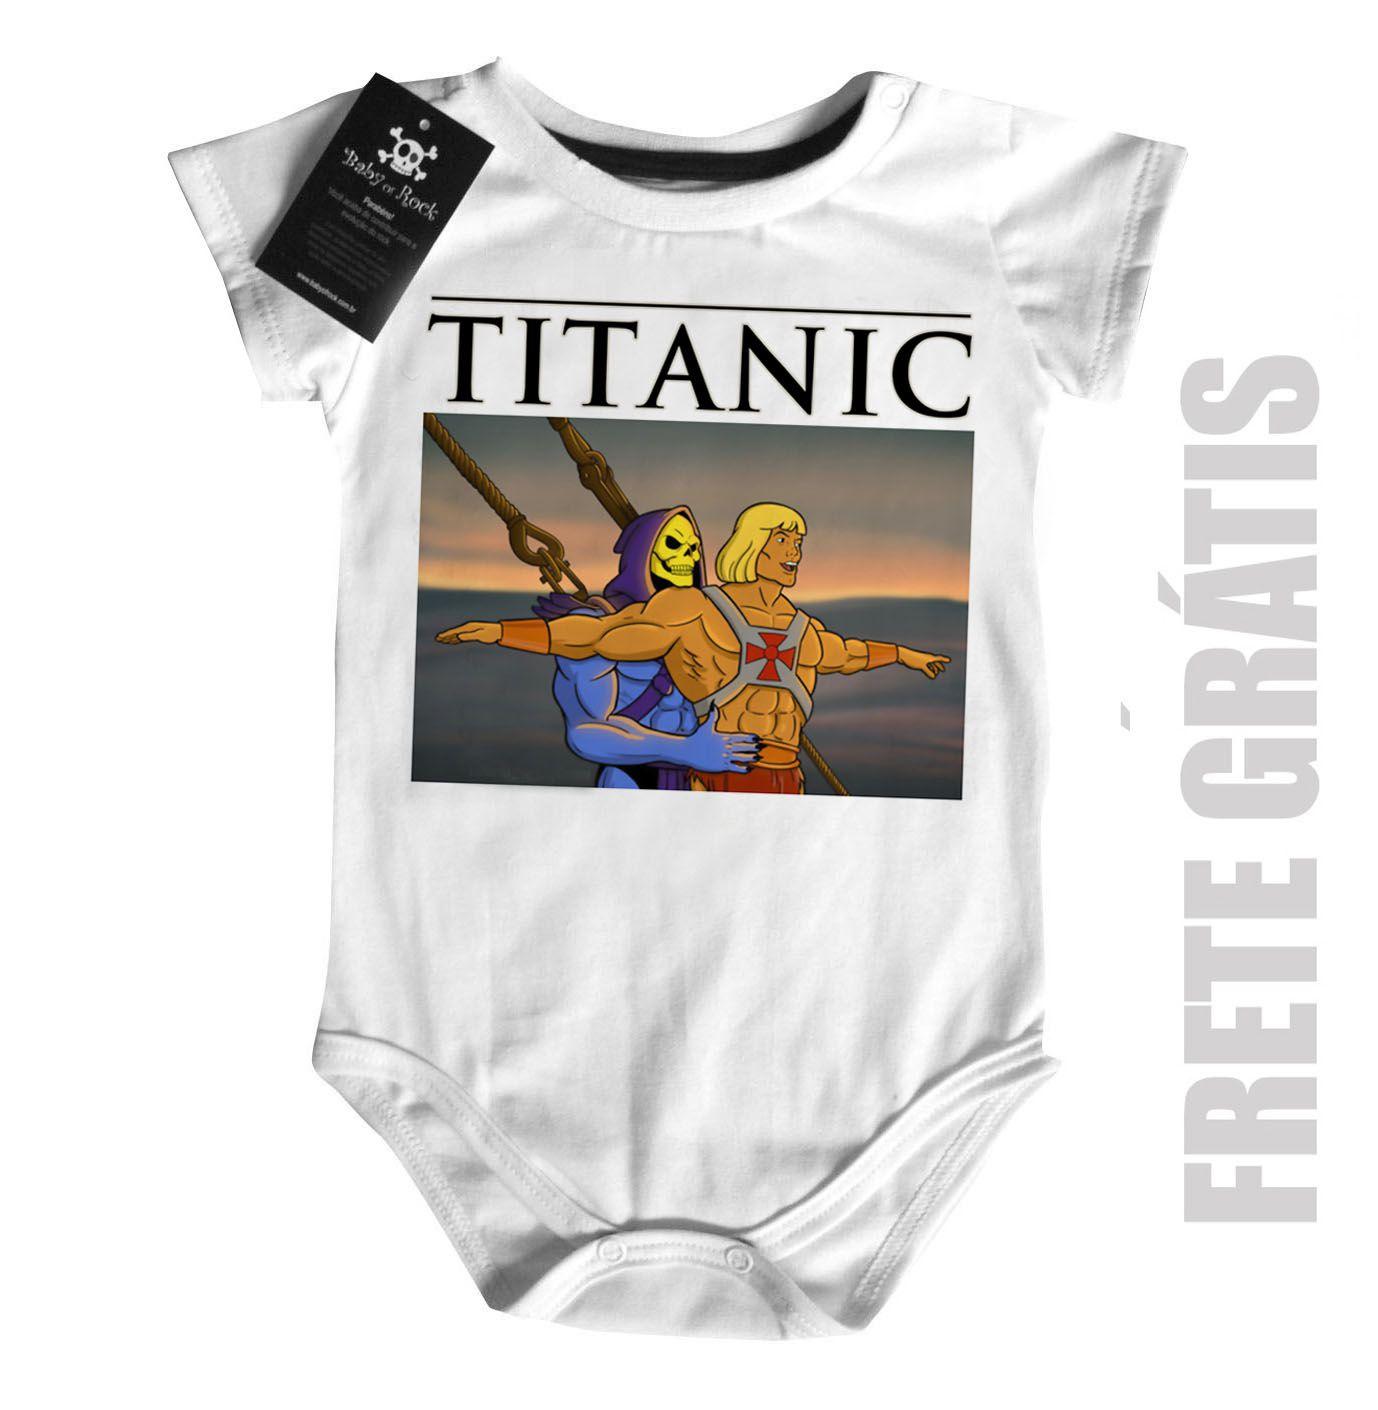 Body Bebê  Titanic He man -  White  - Baby Monster S/A